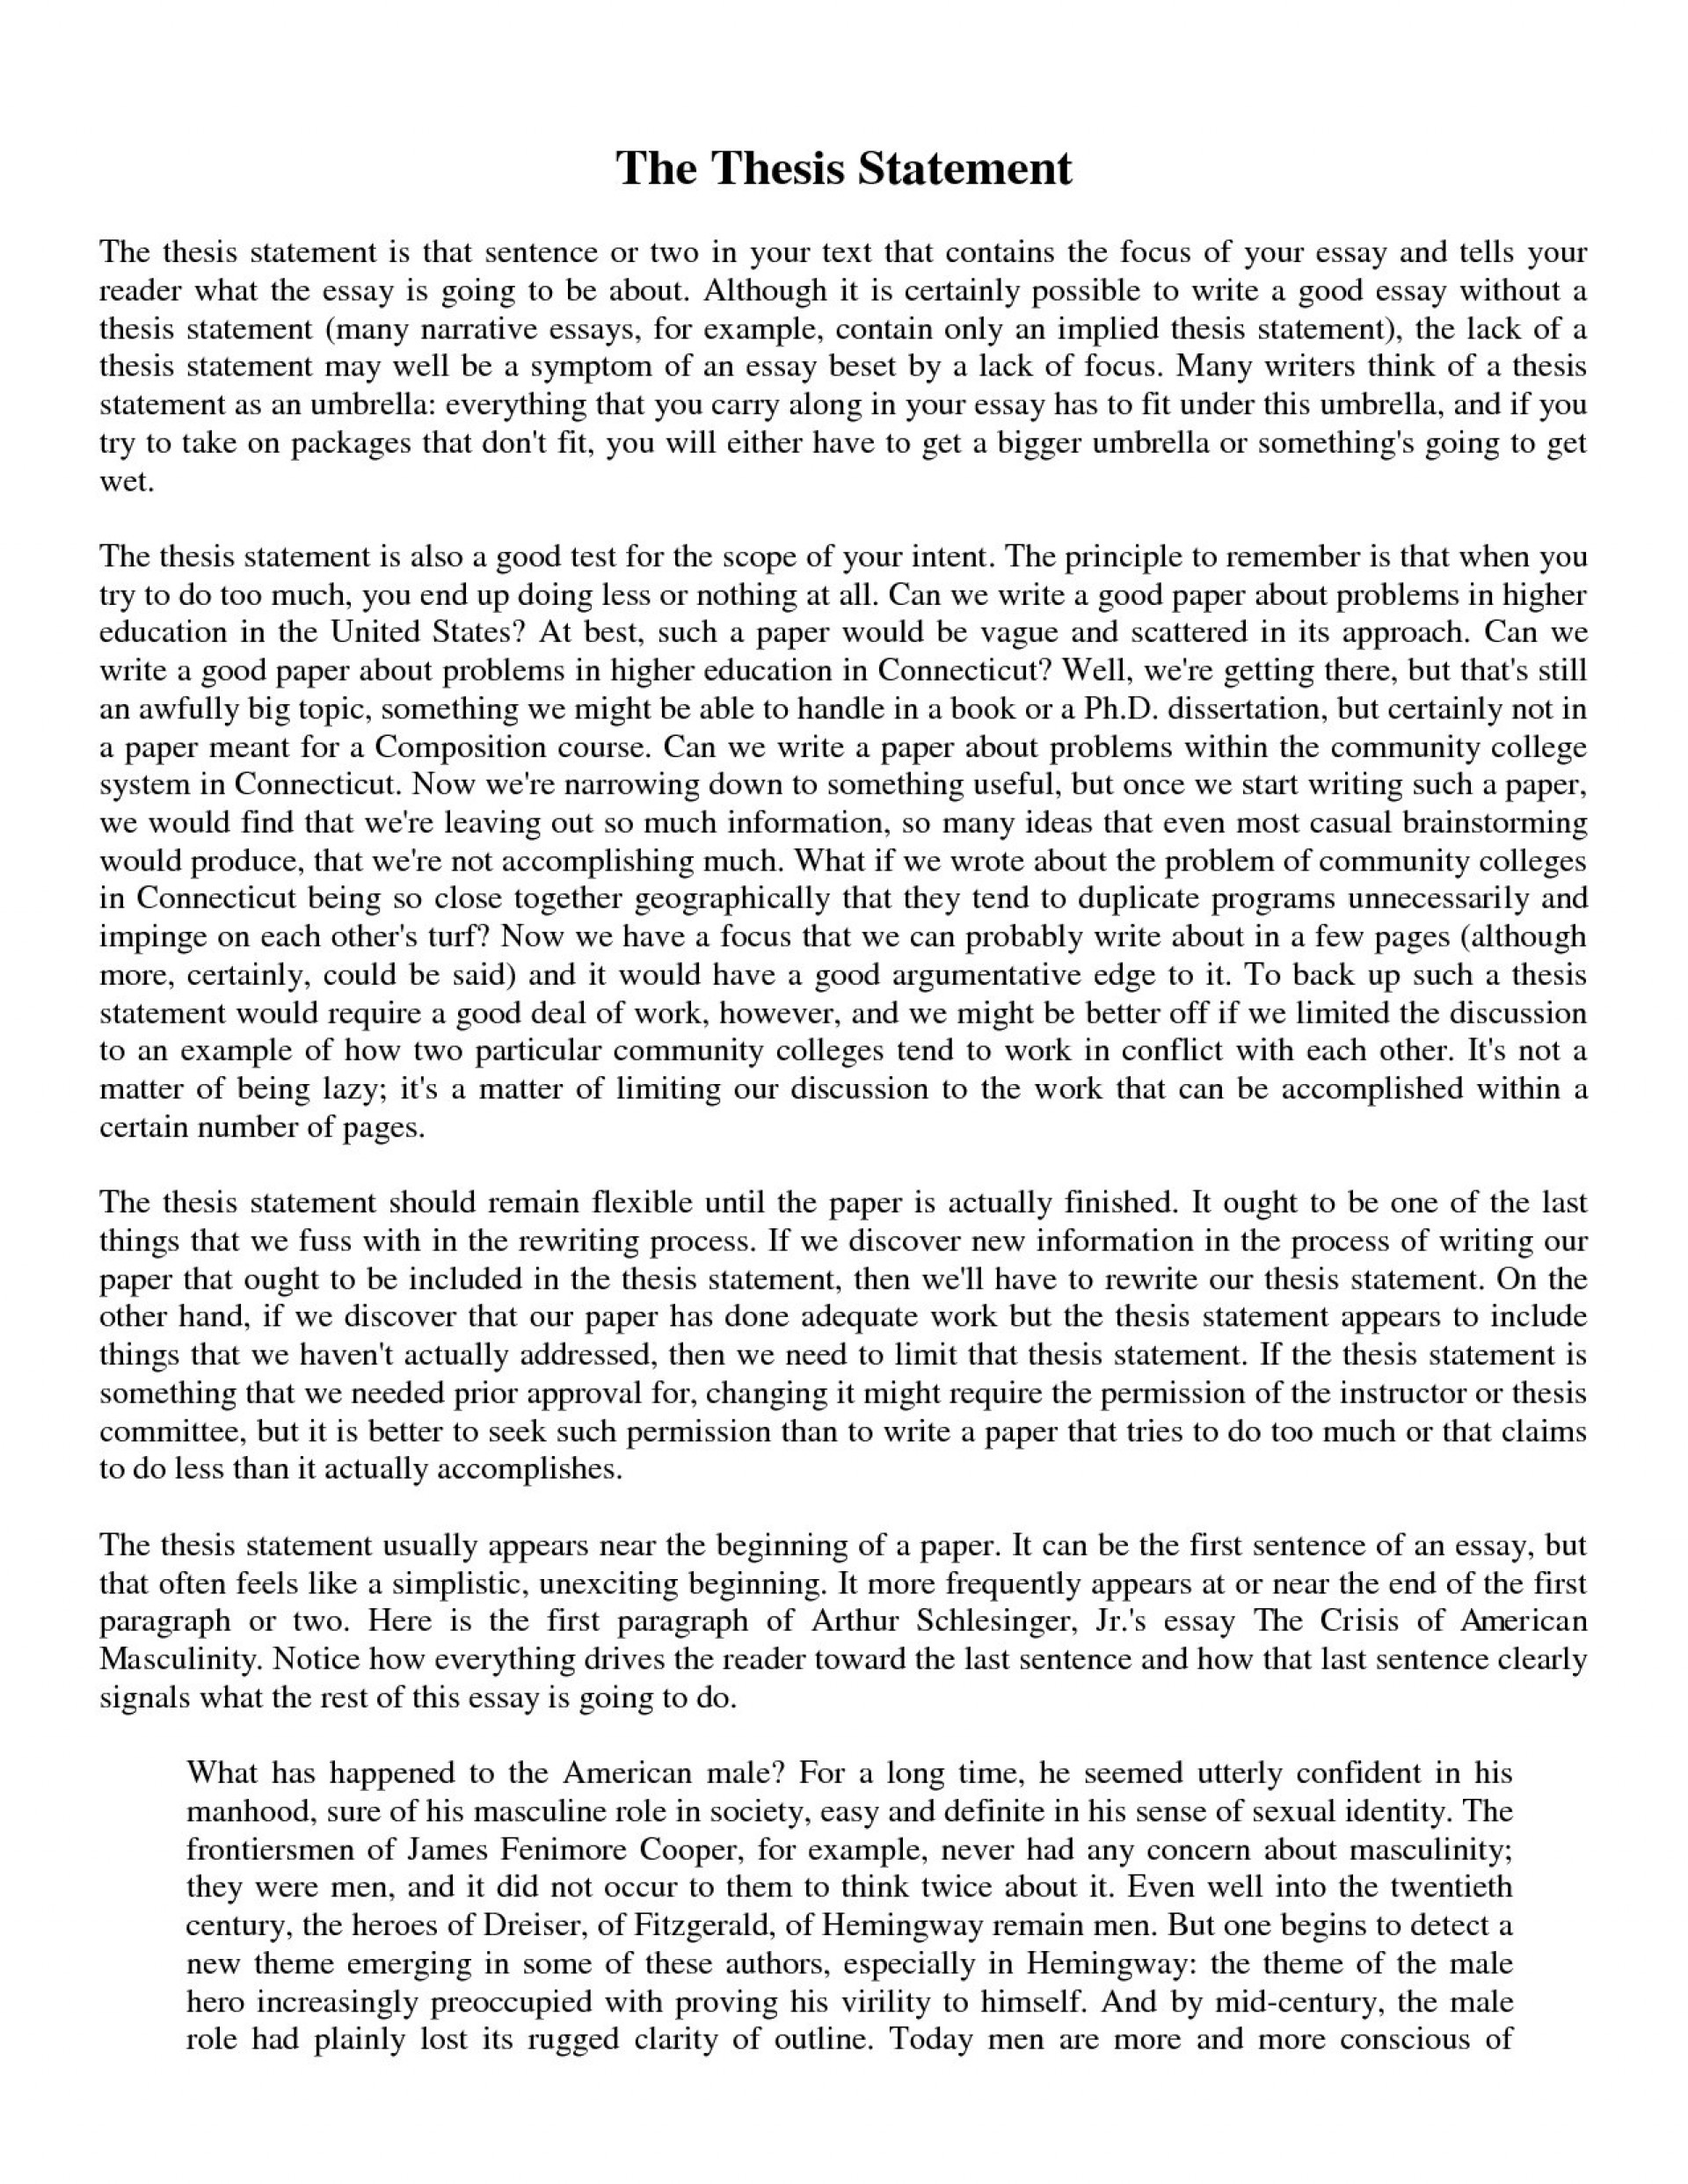 003 Thesis Statement Essay Lt1odxucuo Stirring Descriptive Examples Definition Structure 1920